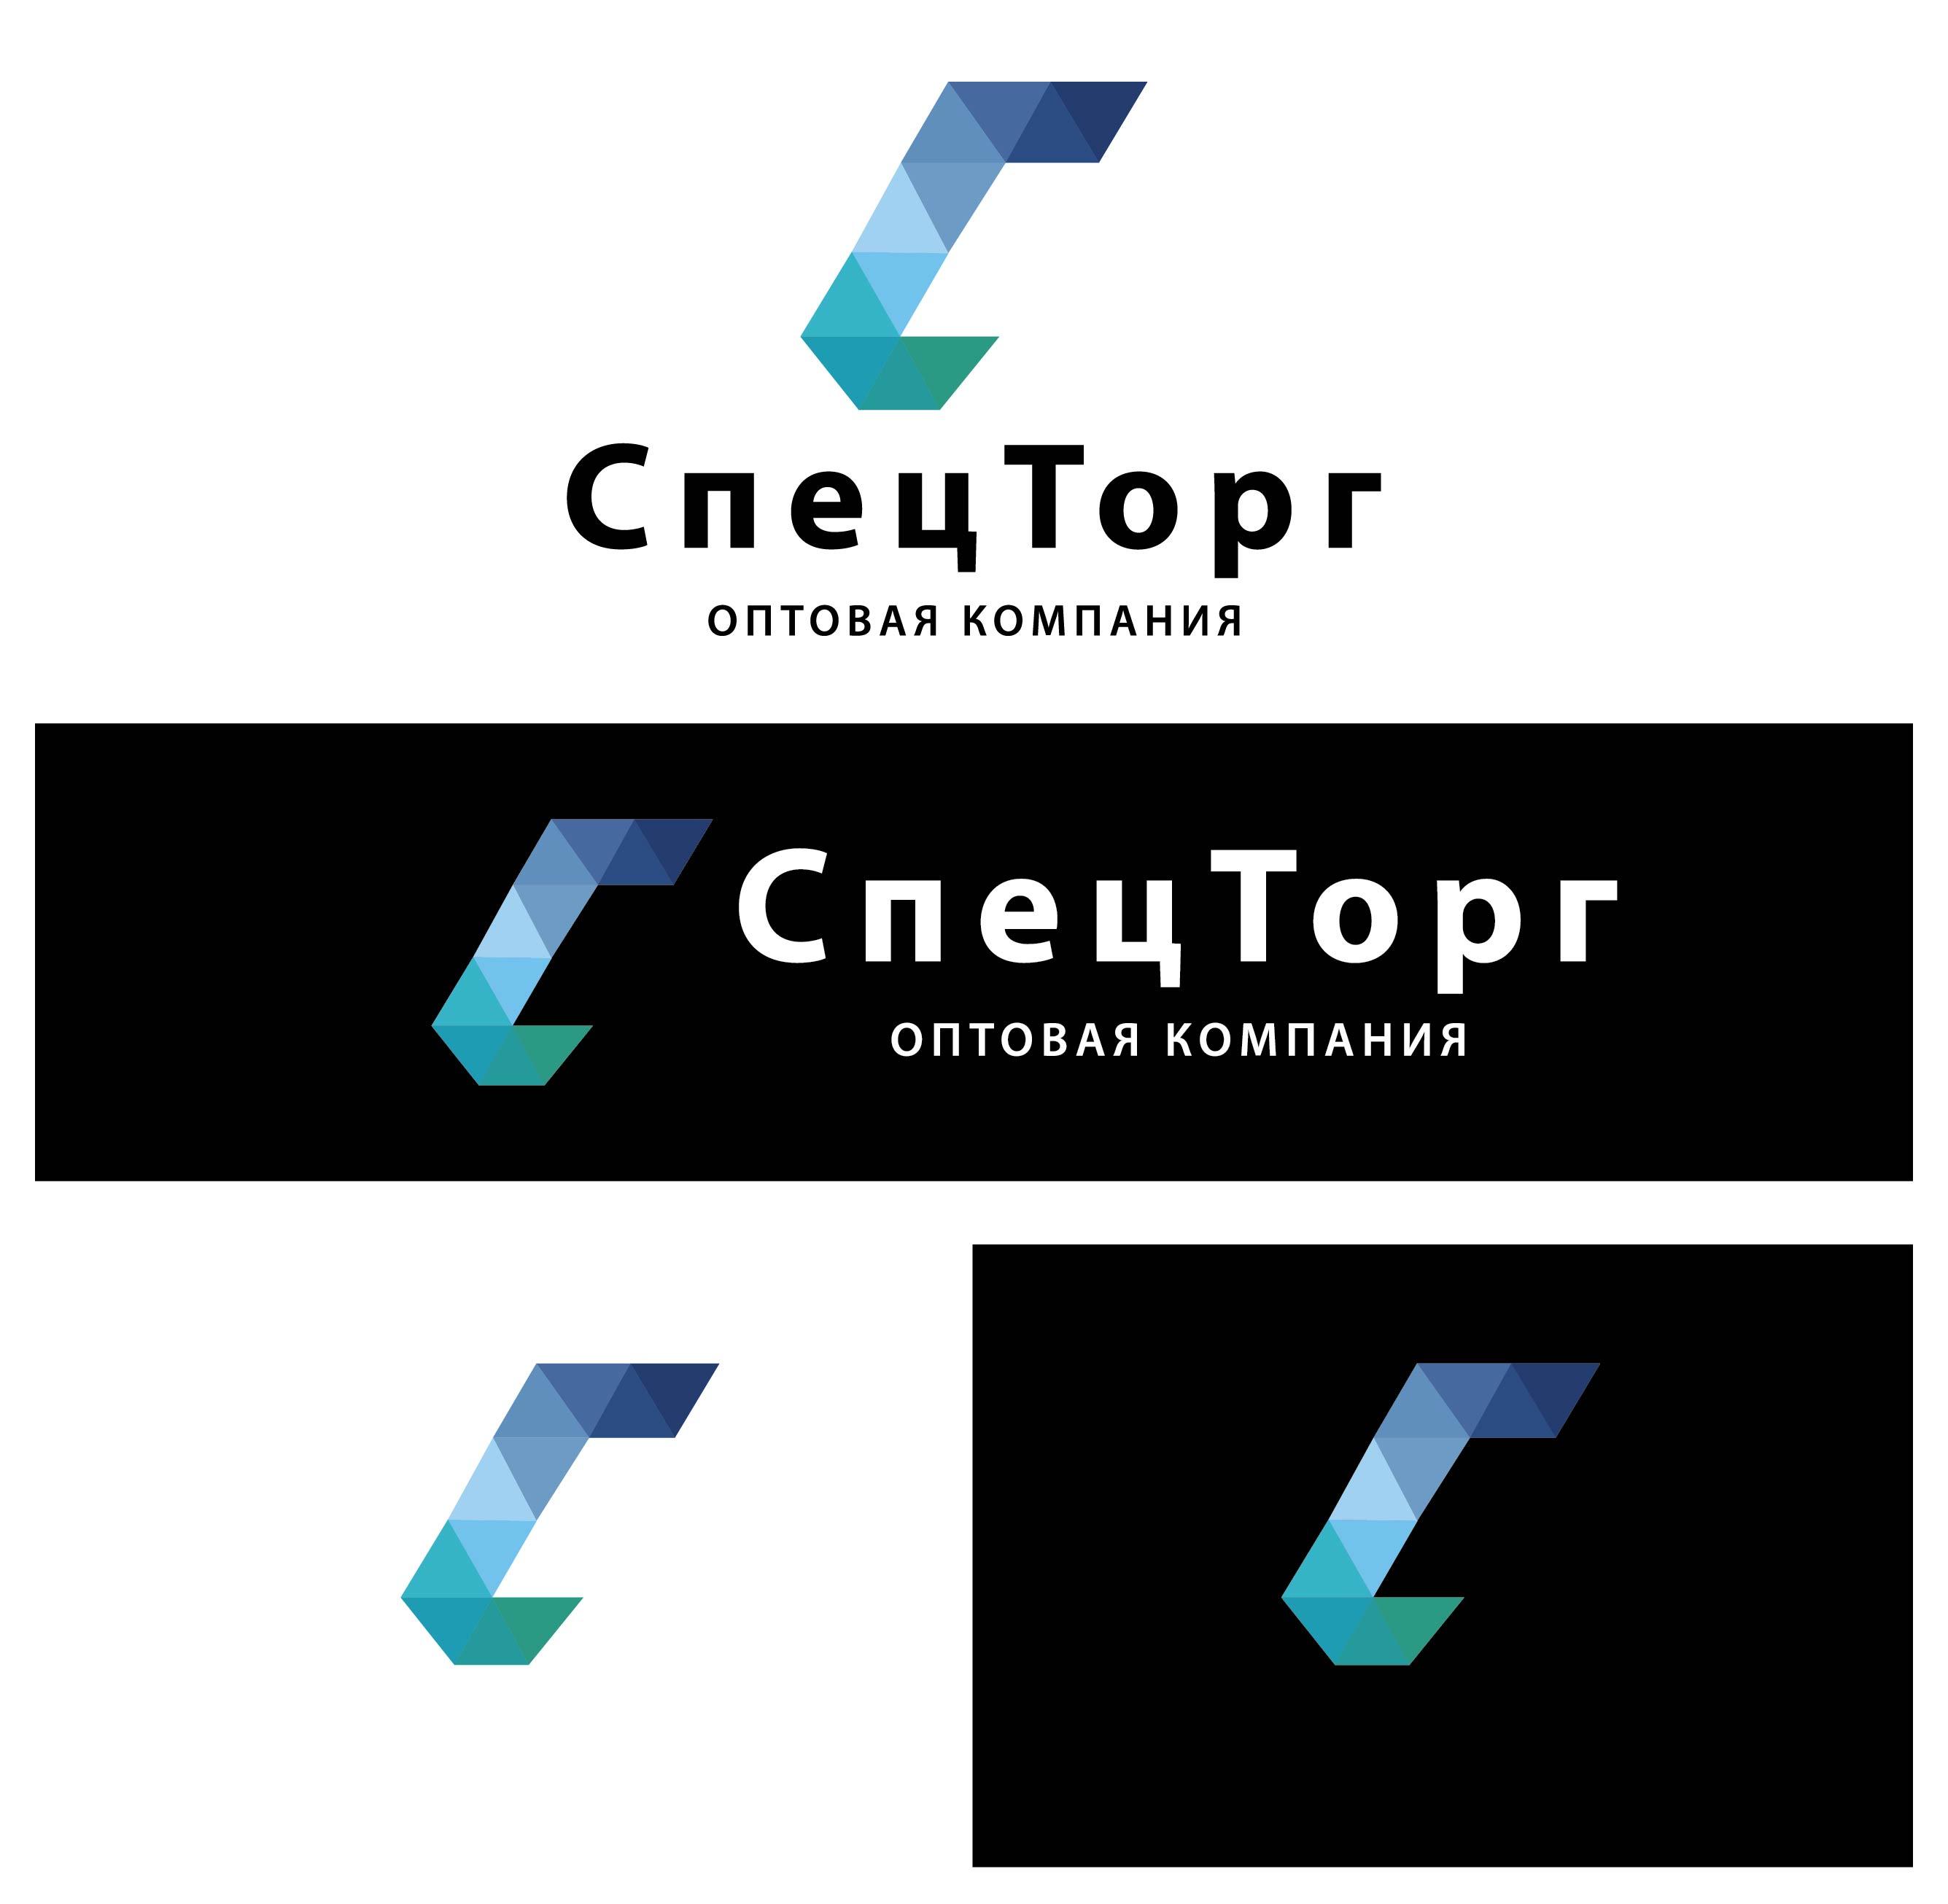 Разработать дизайн  логотипа компании фото f_8955dc4009e17849.jpg